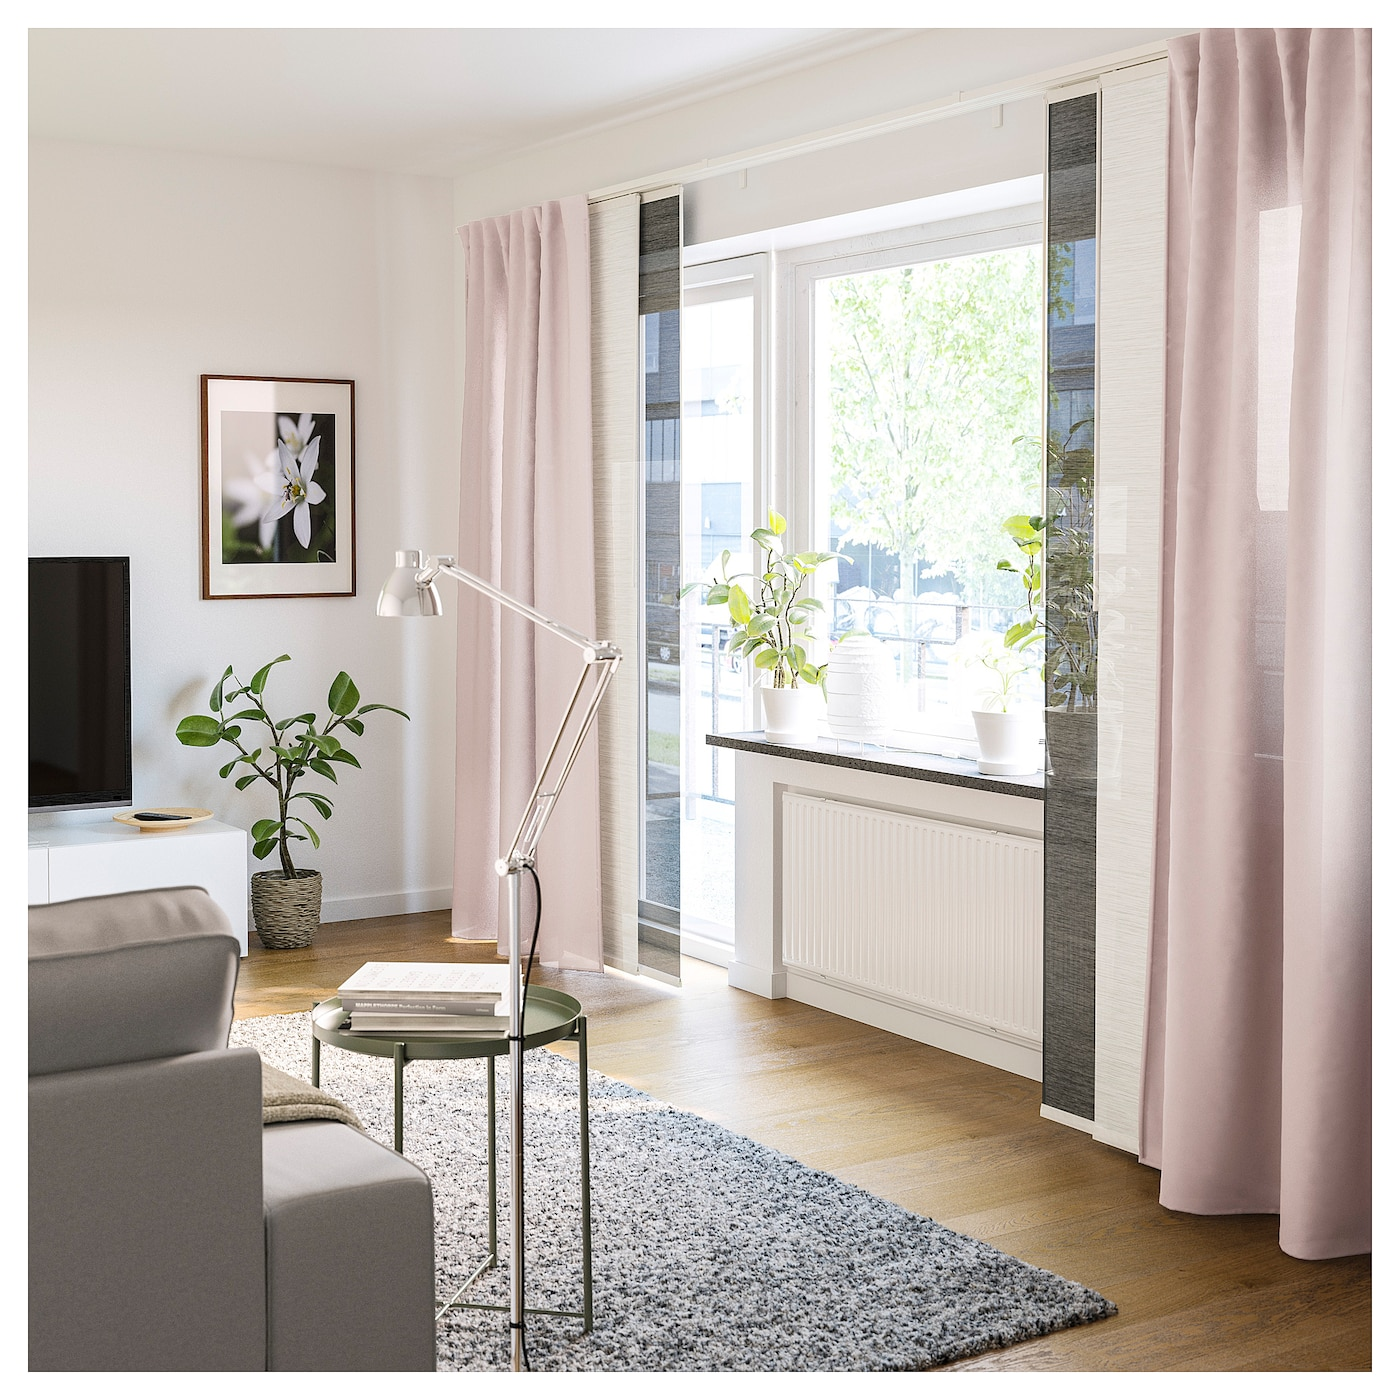 600.833.18 60 x 300cm 24 x 118 Ikea Anno Inez Panel Curtain Room Divider Sheer Panel Curtain